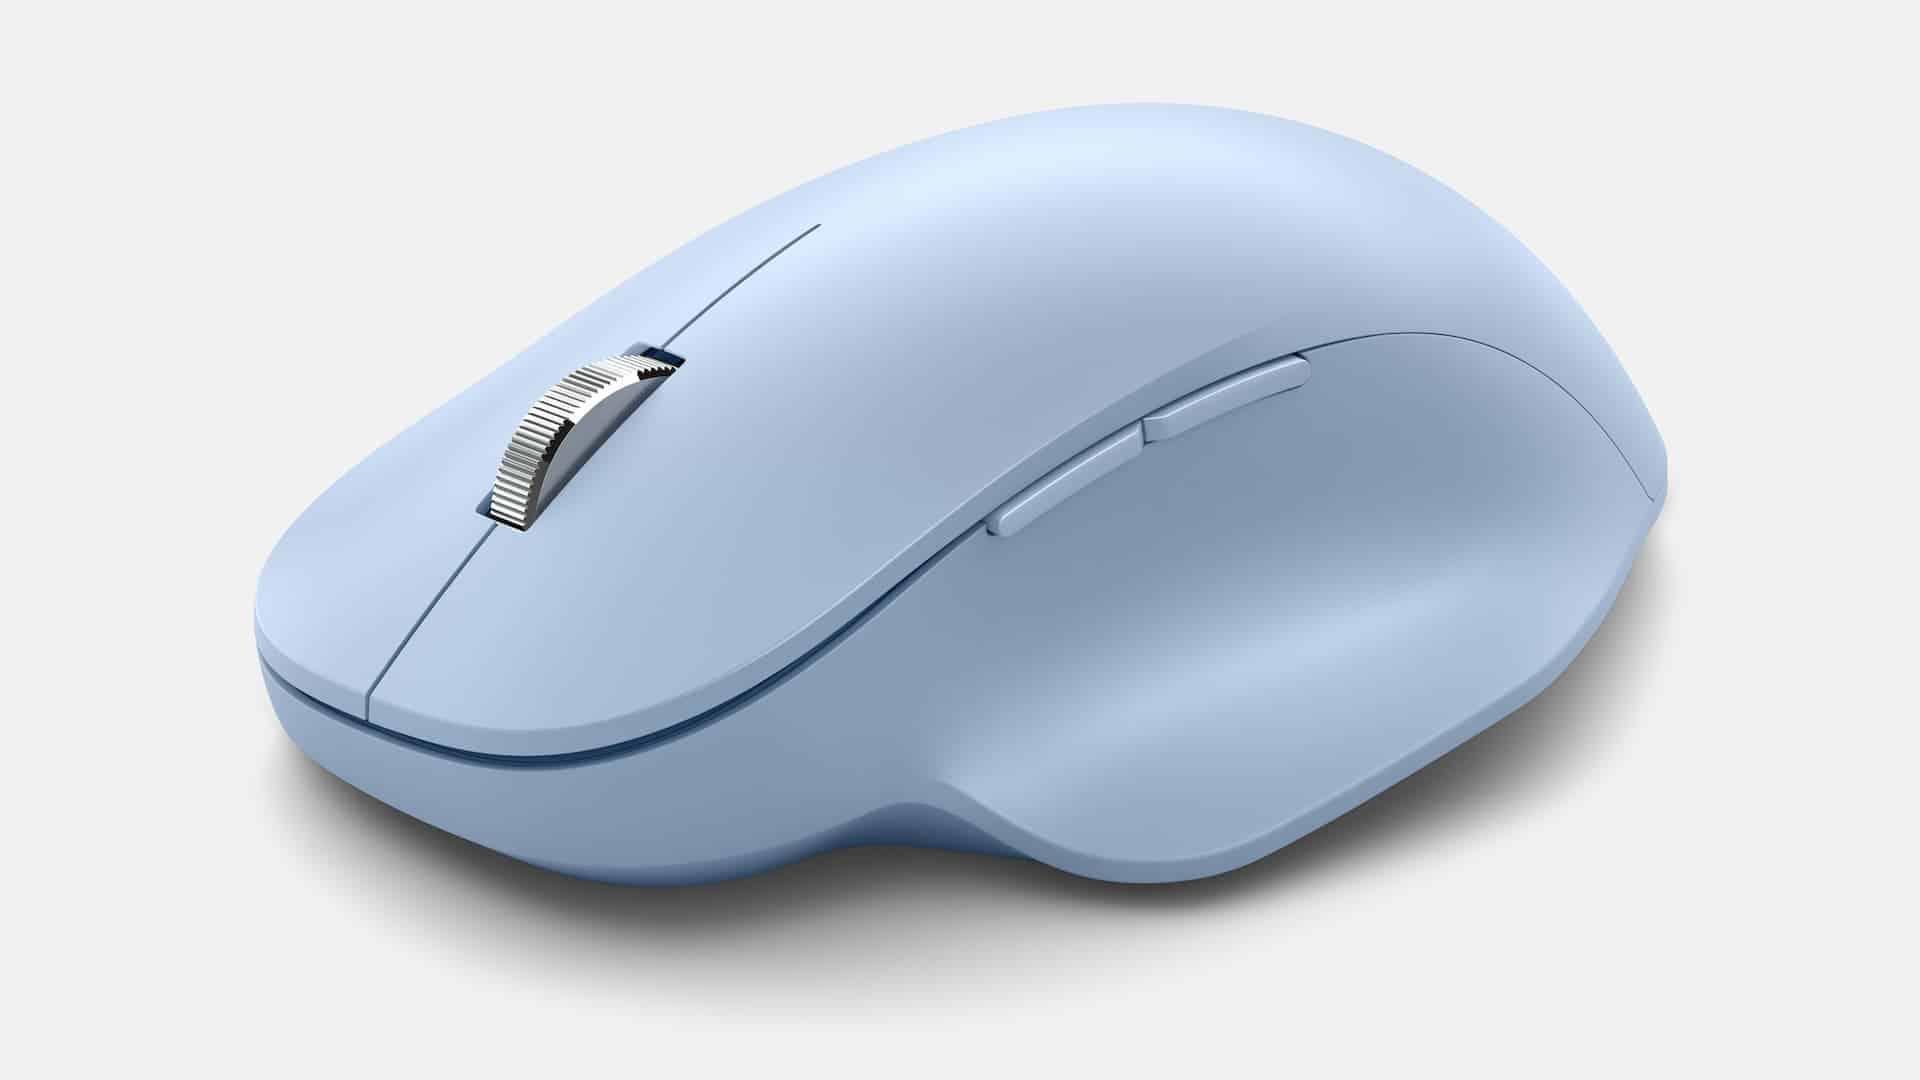 microsoft surface Bluetooth Ergonomic Mouse presser